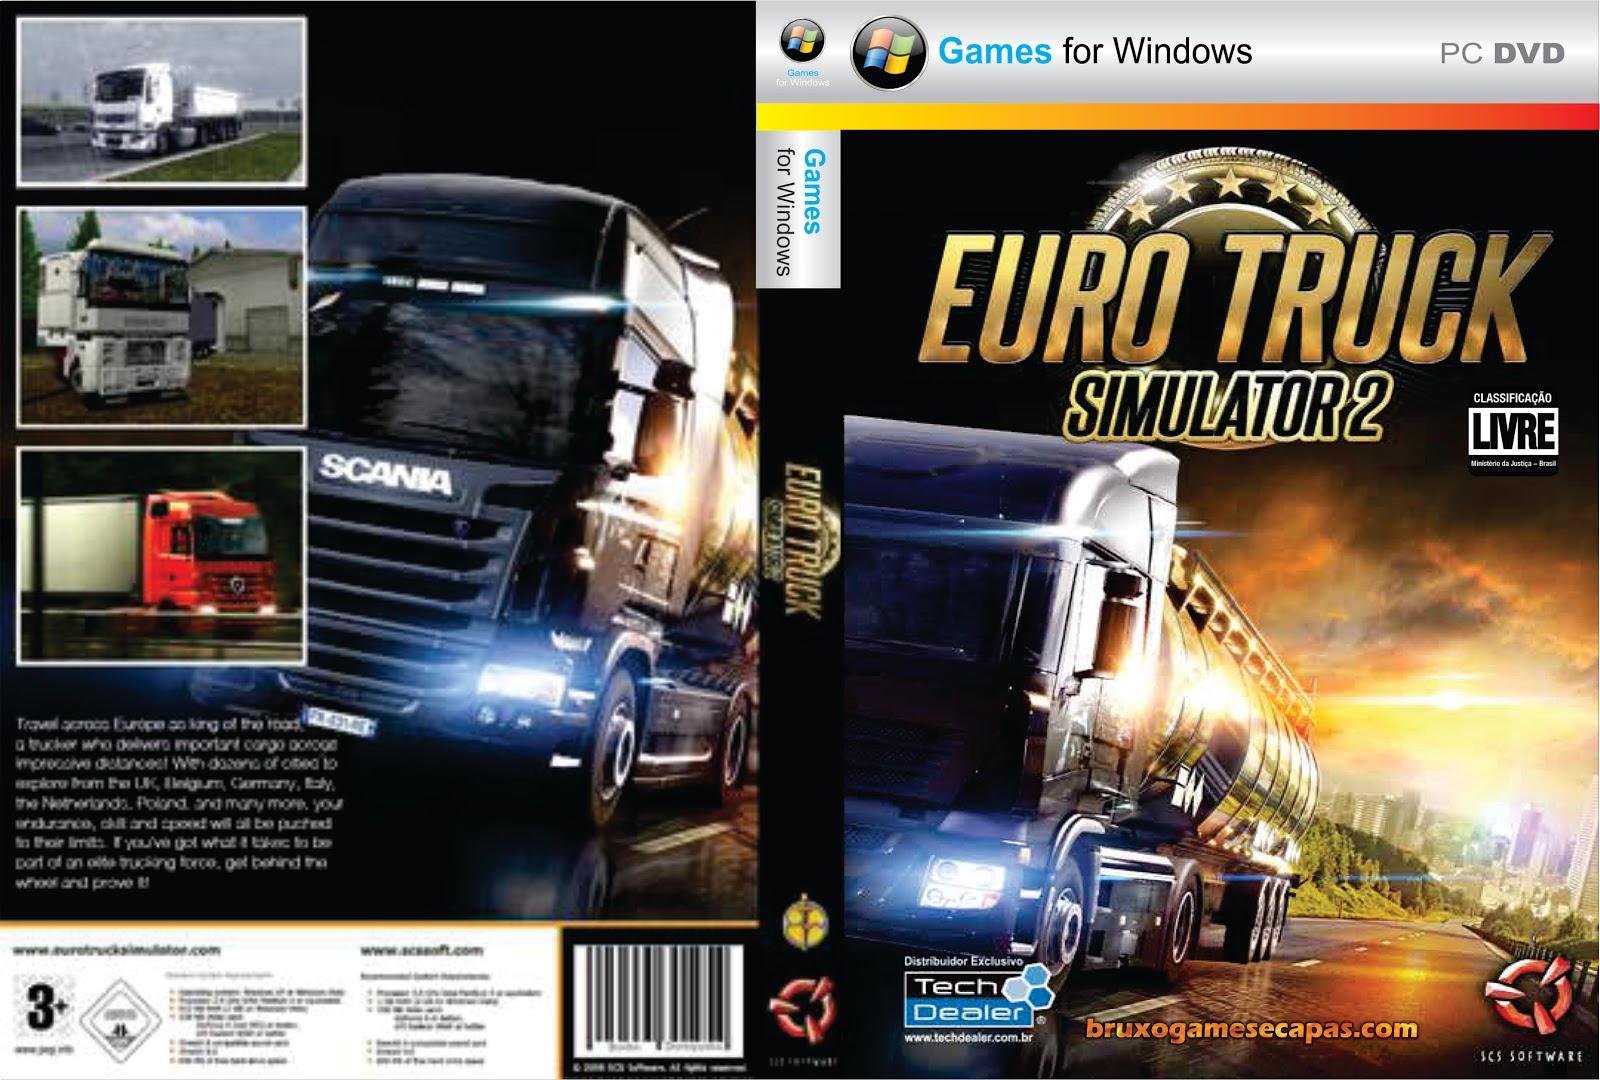 baixar games gratuitos download euro truck simulator 2 pc. Black Bedroom Furniture Sets. Home Design Ideas